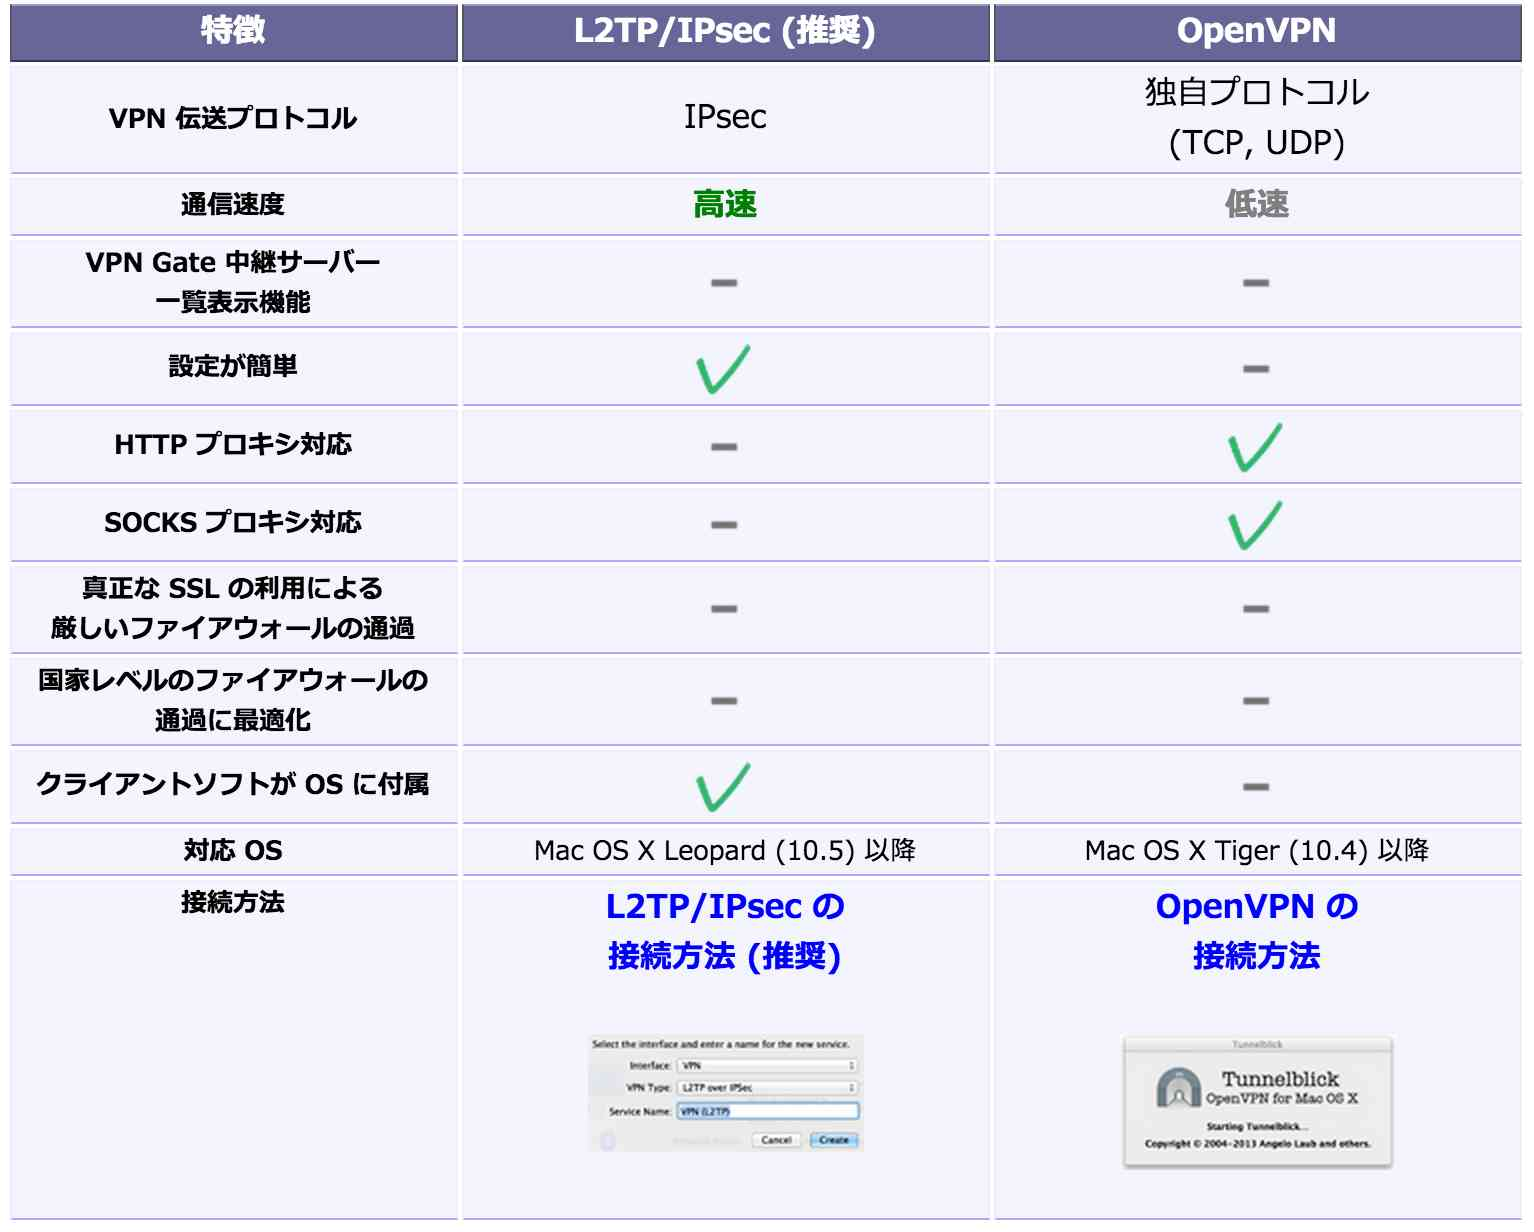 MacでVPN接続する場合のL2TP/IPsecとOpenVPNの違い